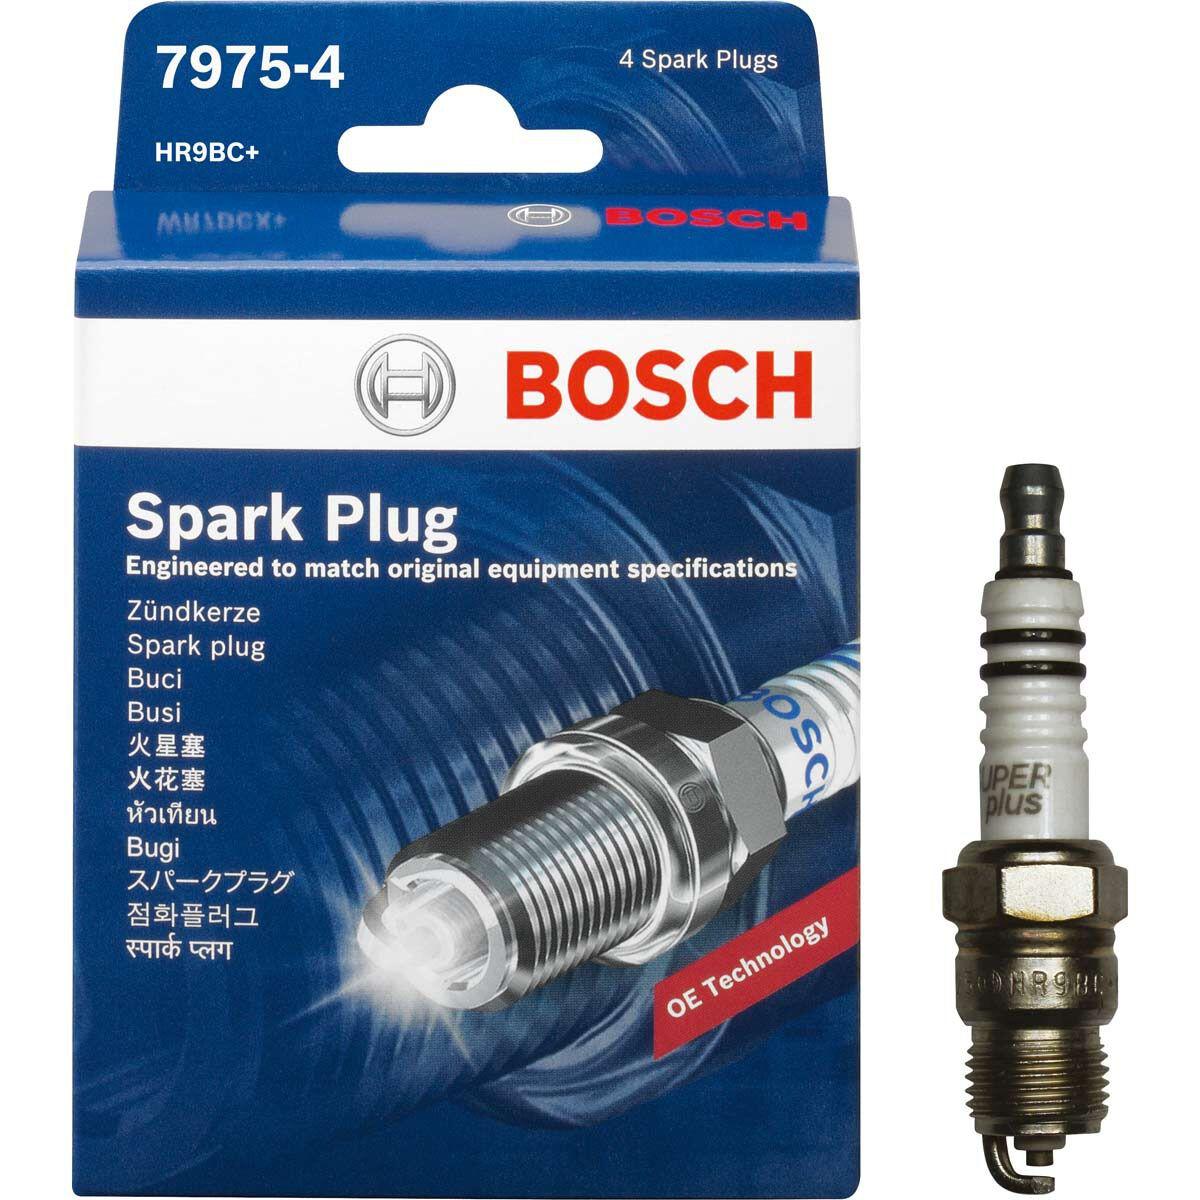 SET OF 10 BOSCH 7975 COPPER SPARK PLUGS